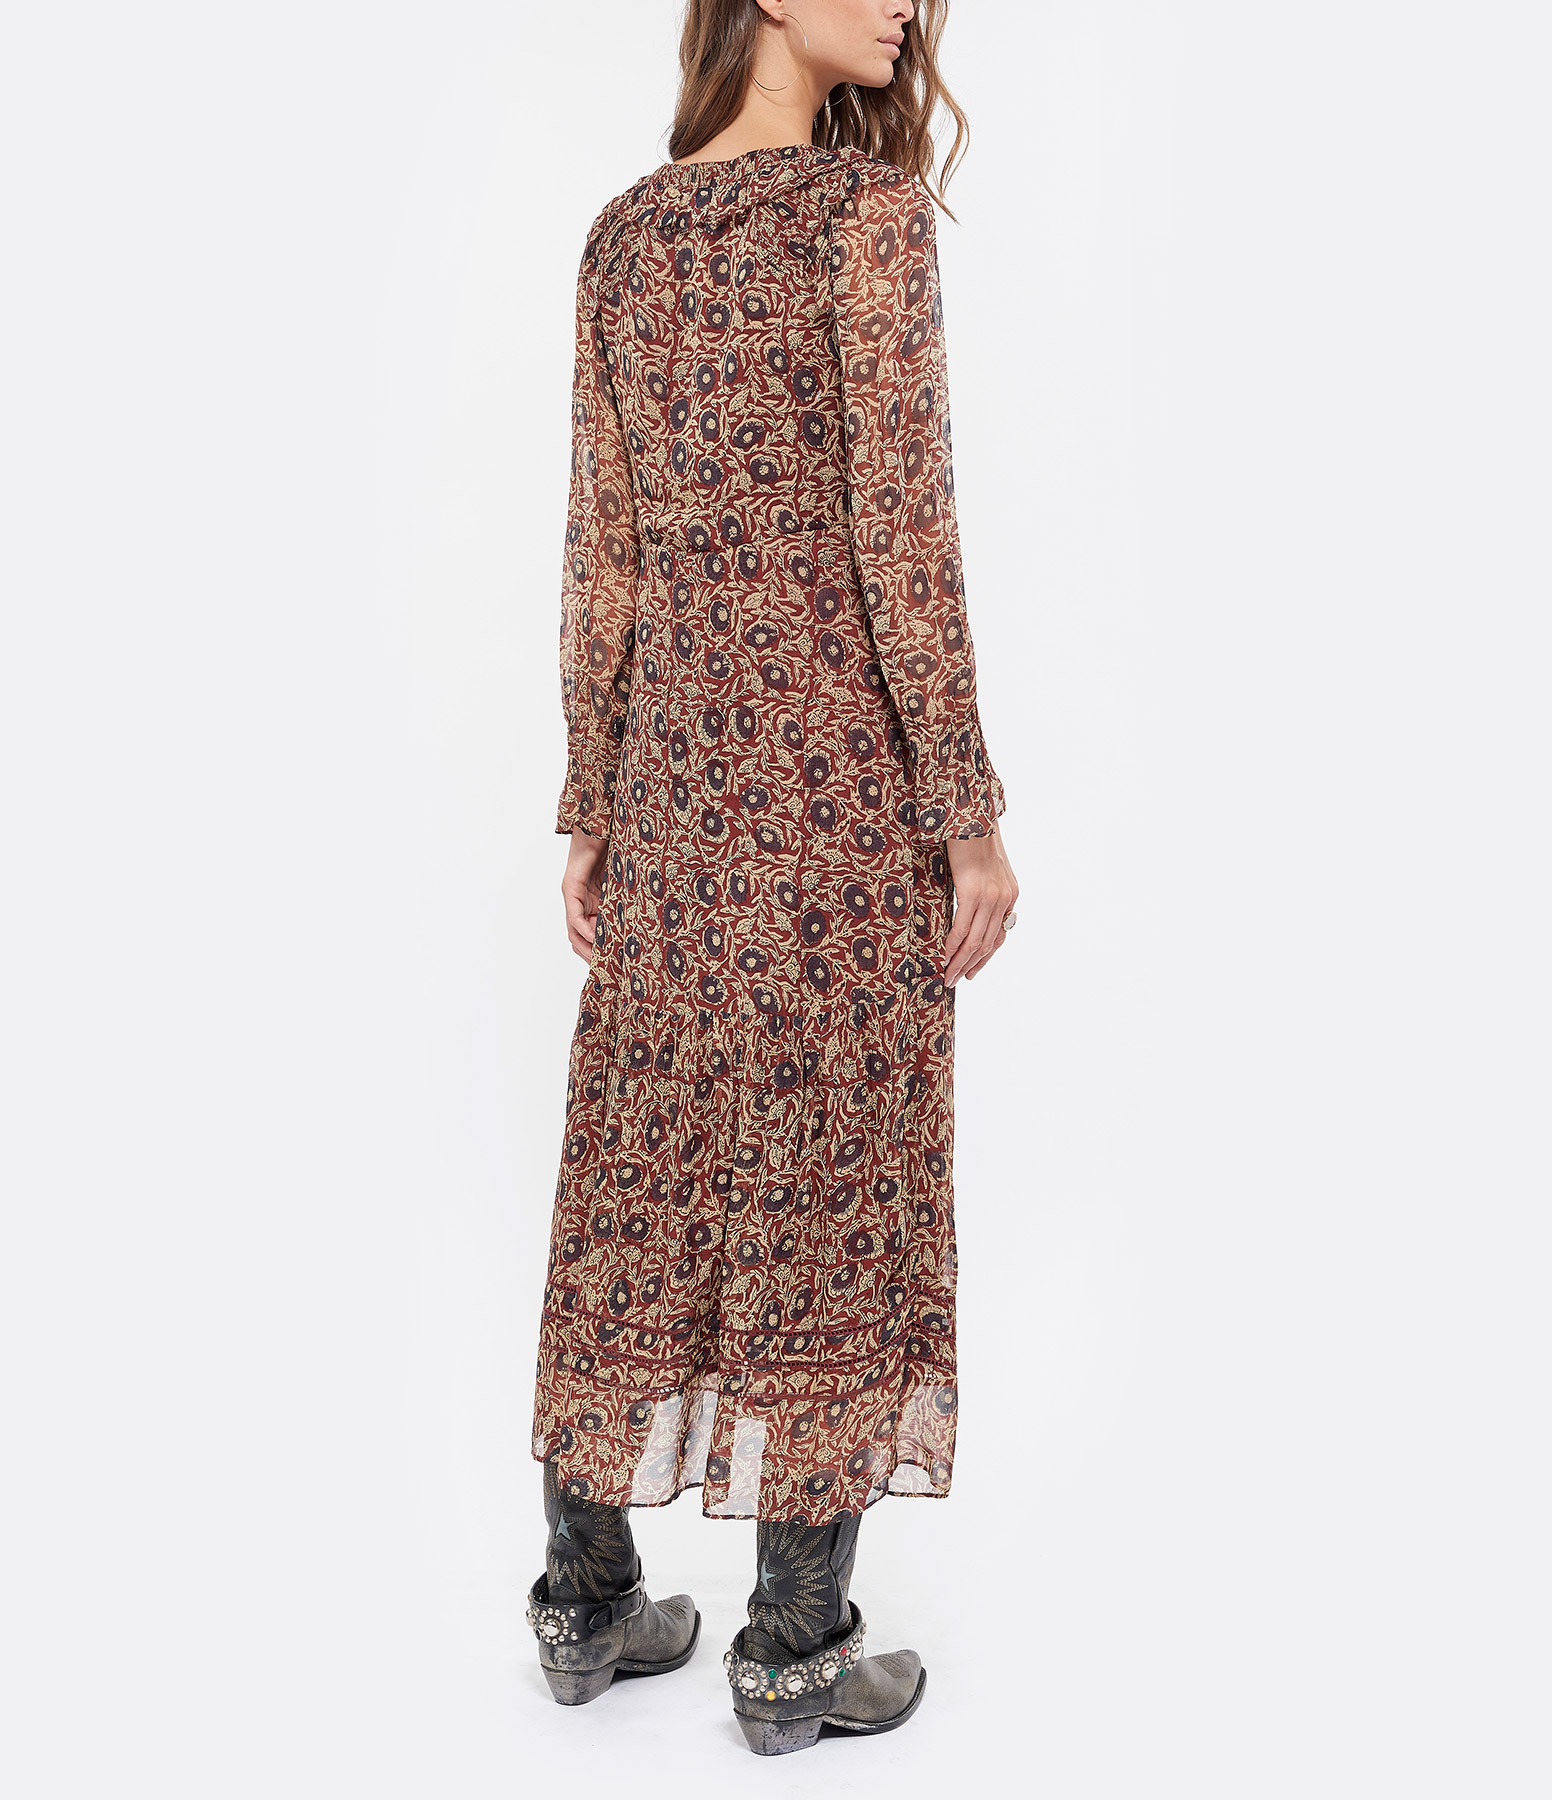 SEA NEW YORK - Robe Longue Imprimé Fleur Brique